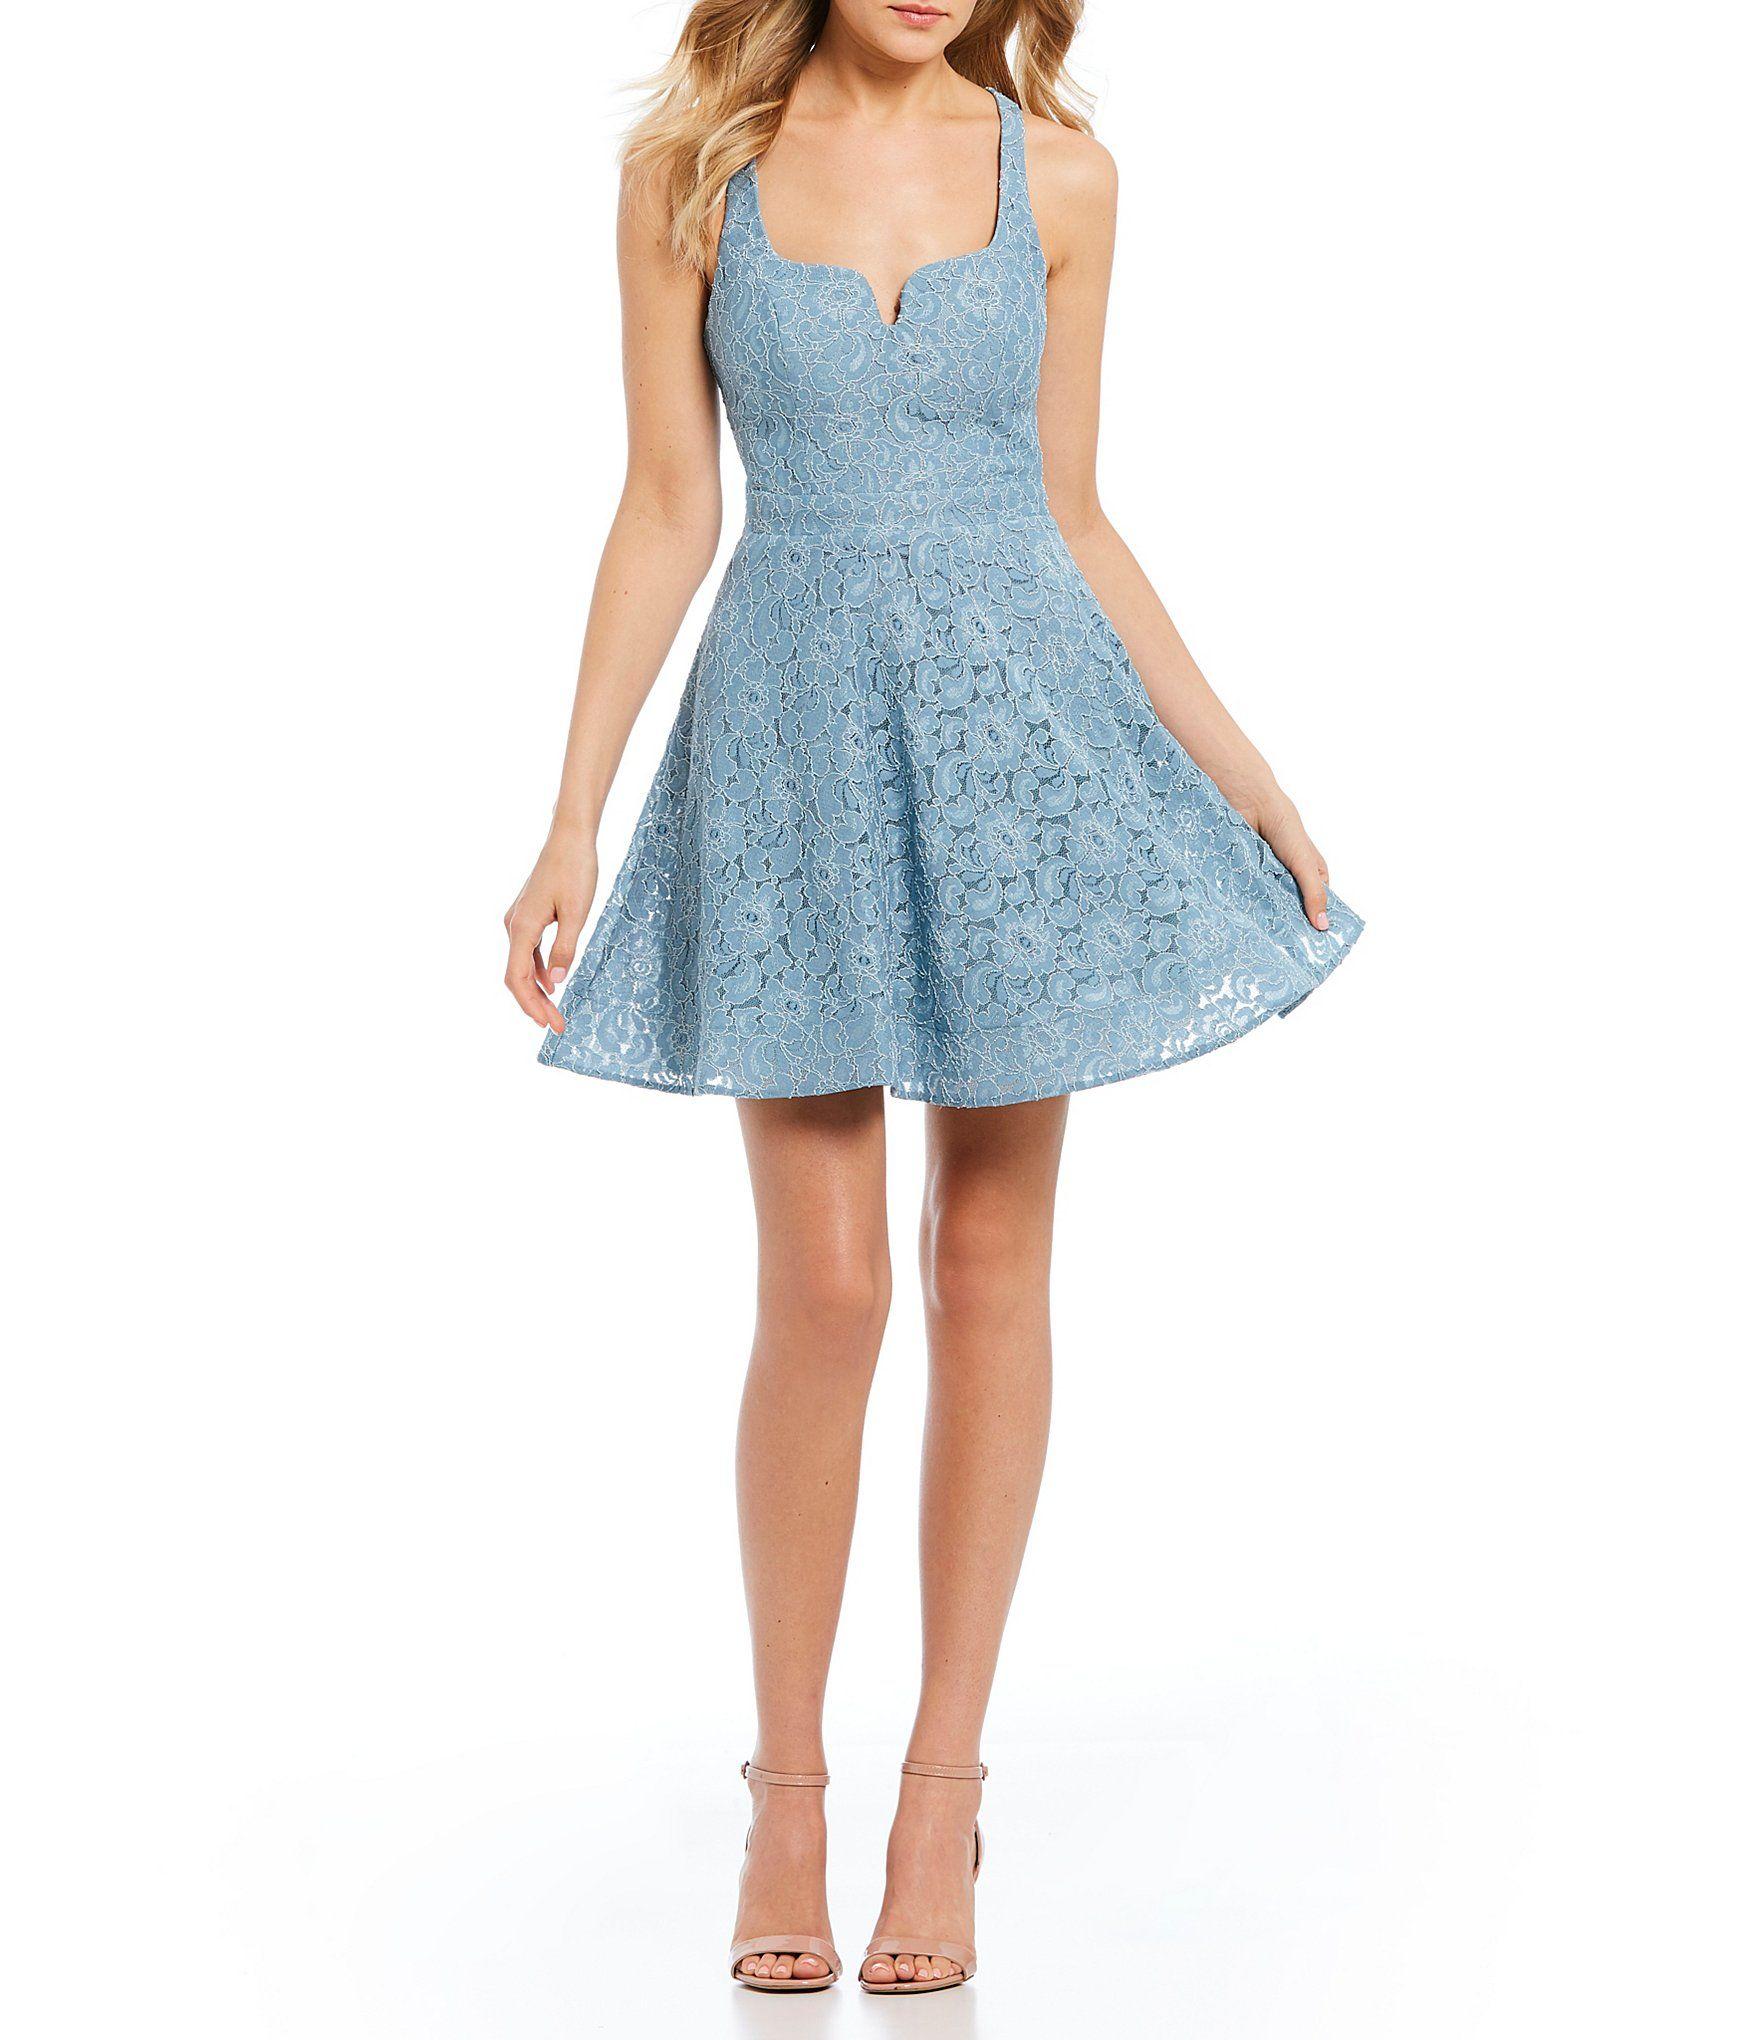 451bc4807 Junior Prom Dresses Dillards - Barrier Surveillance